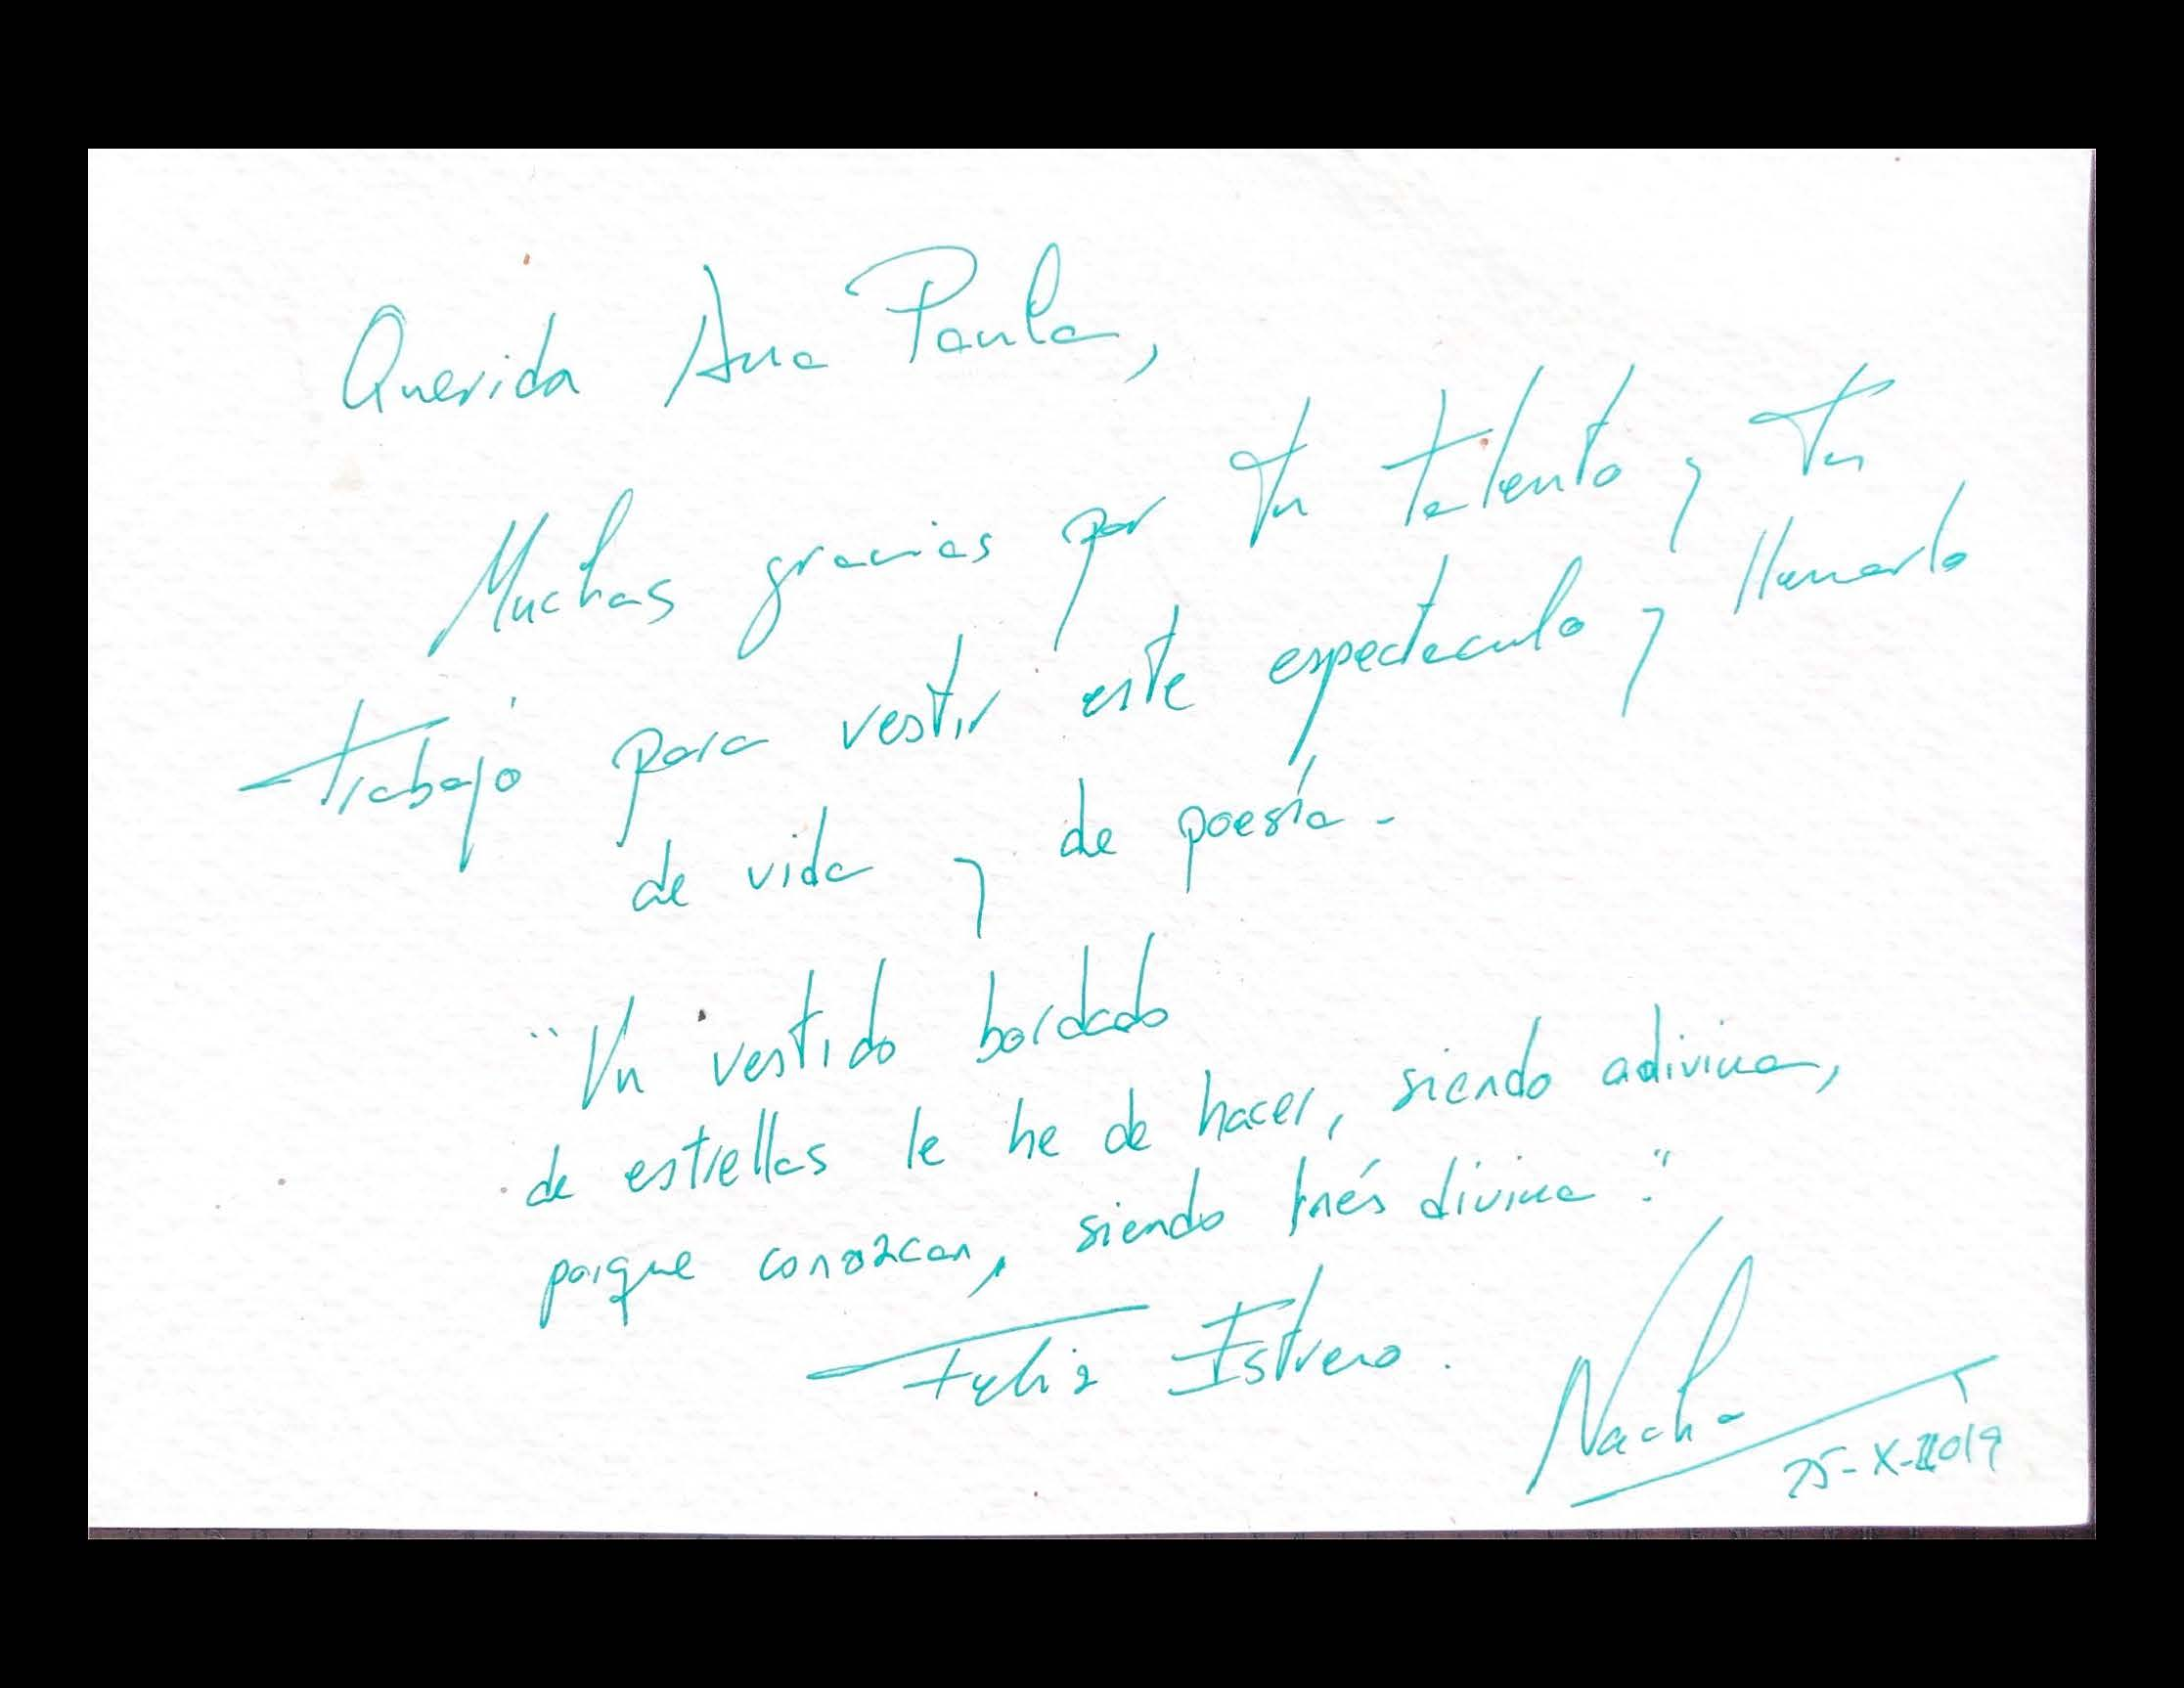 Ana Paula Rocha - Testemunhos - 015